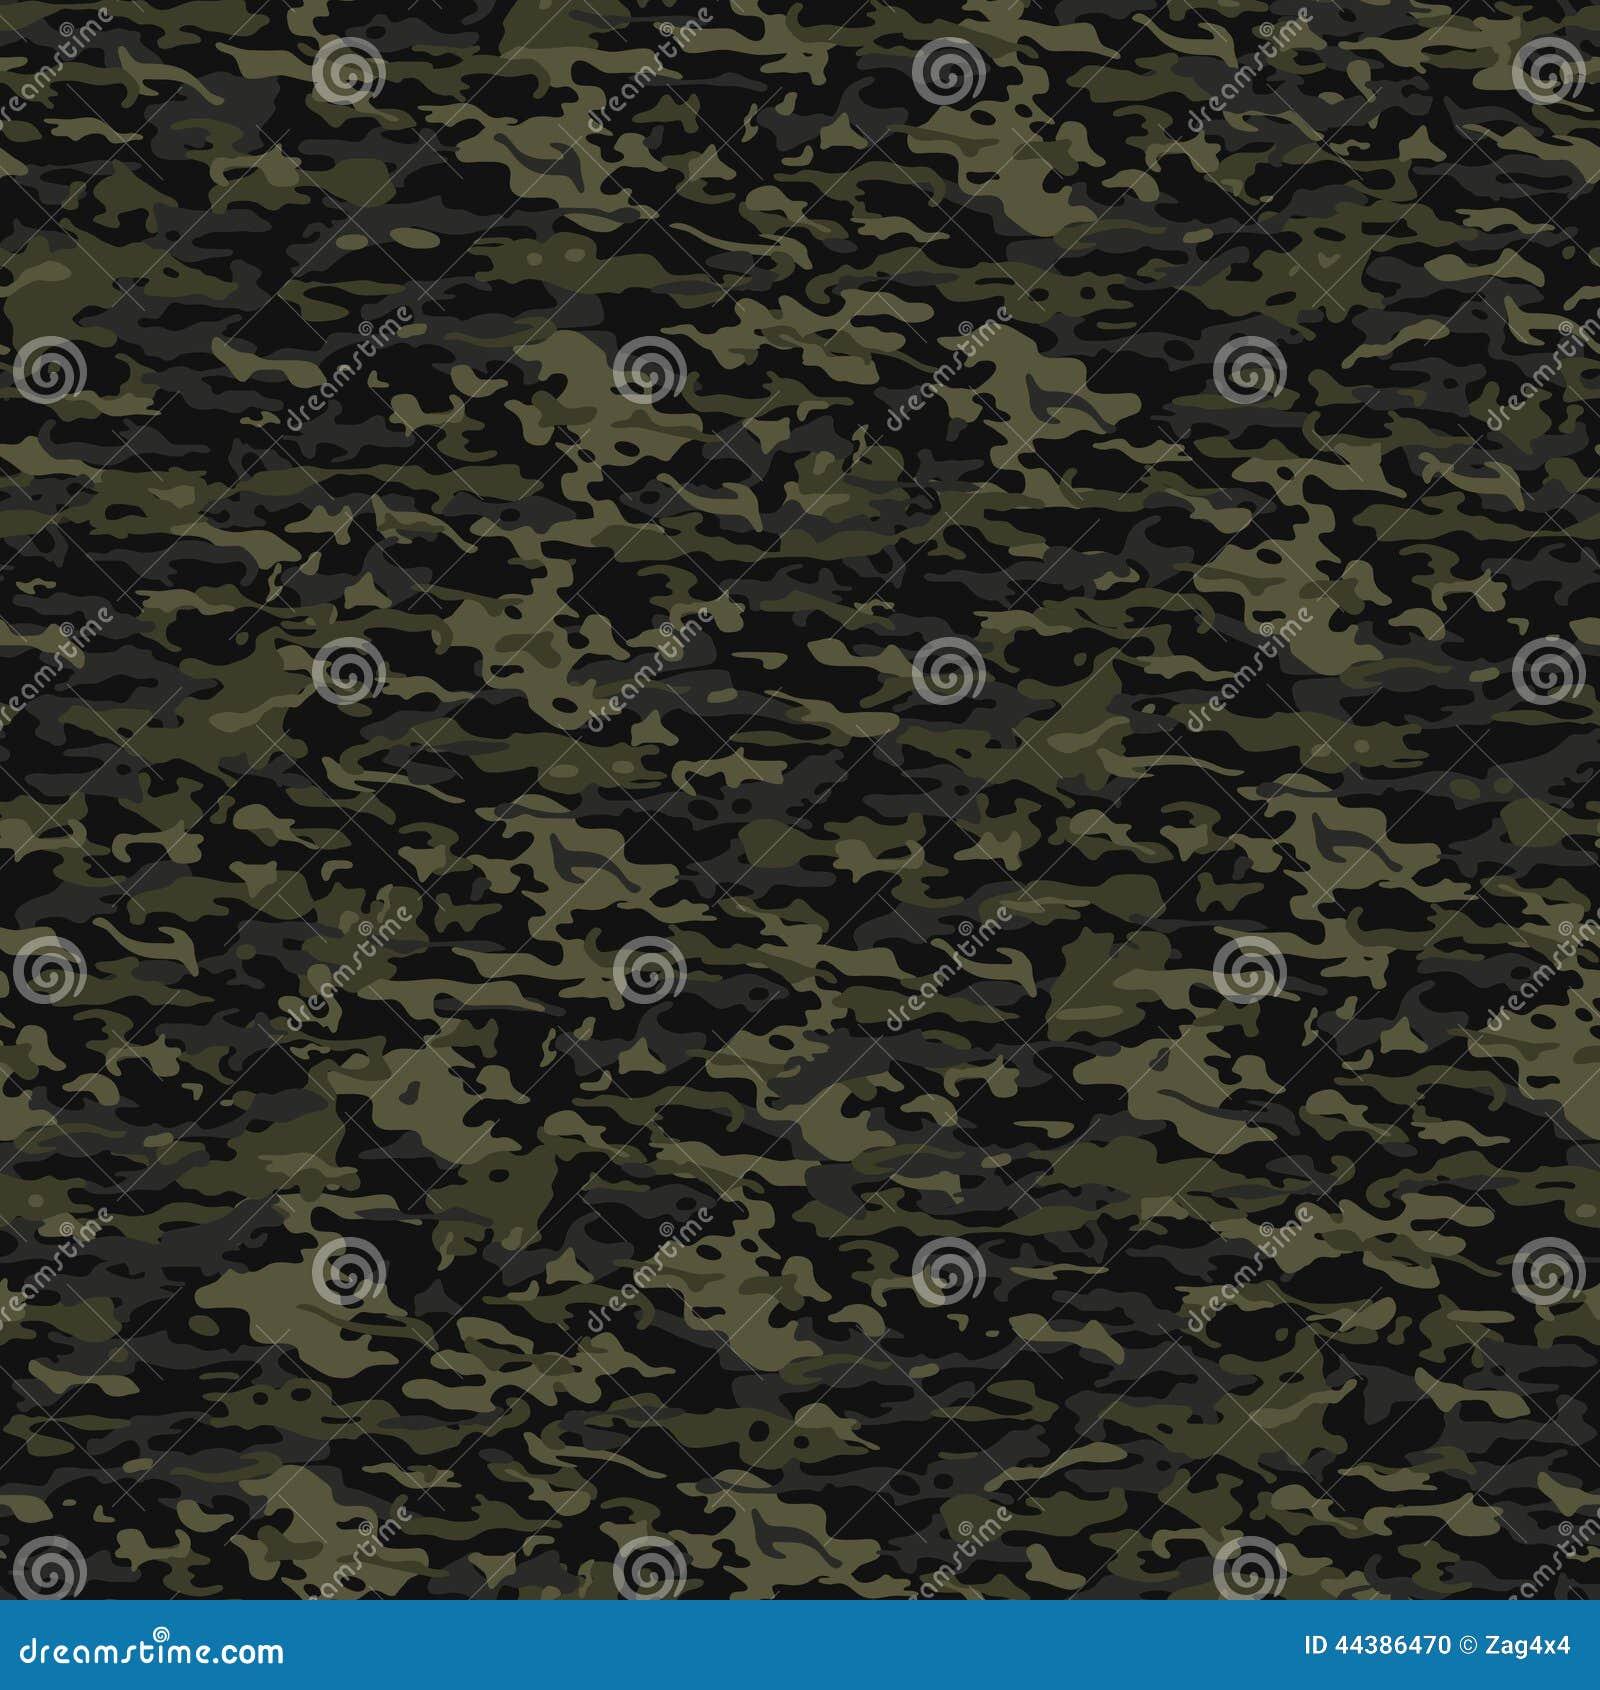 Green Camouflage Stock Illustration - Image: 44386470